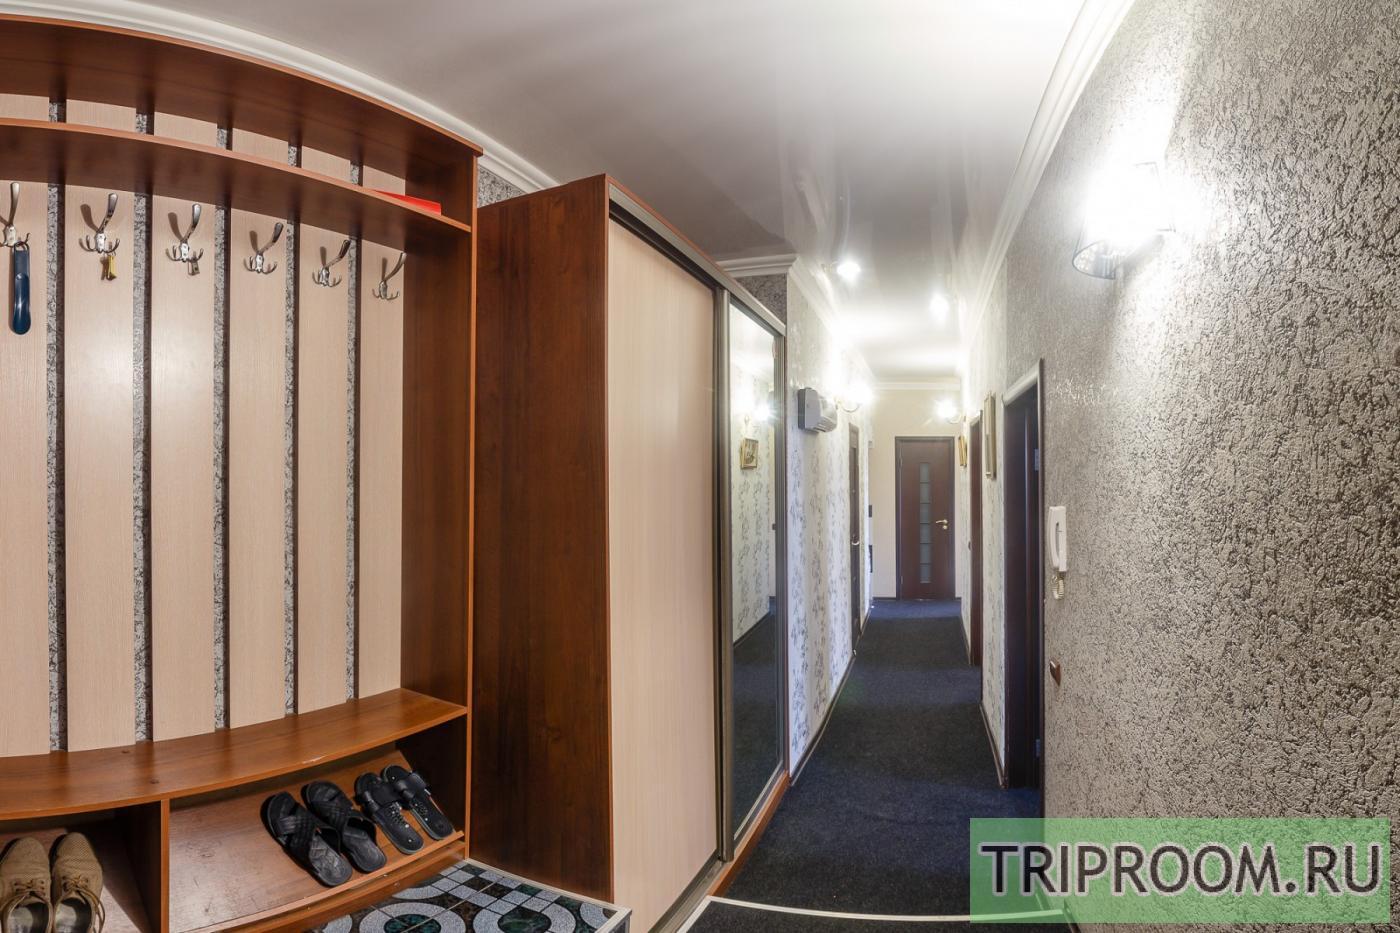 3-комнатная квартира посуточно (вариант № 15948), ул. Назарбаева улица, фото № 9